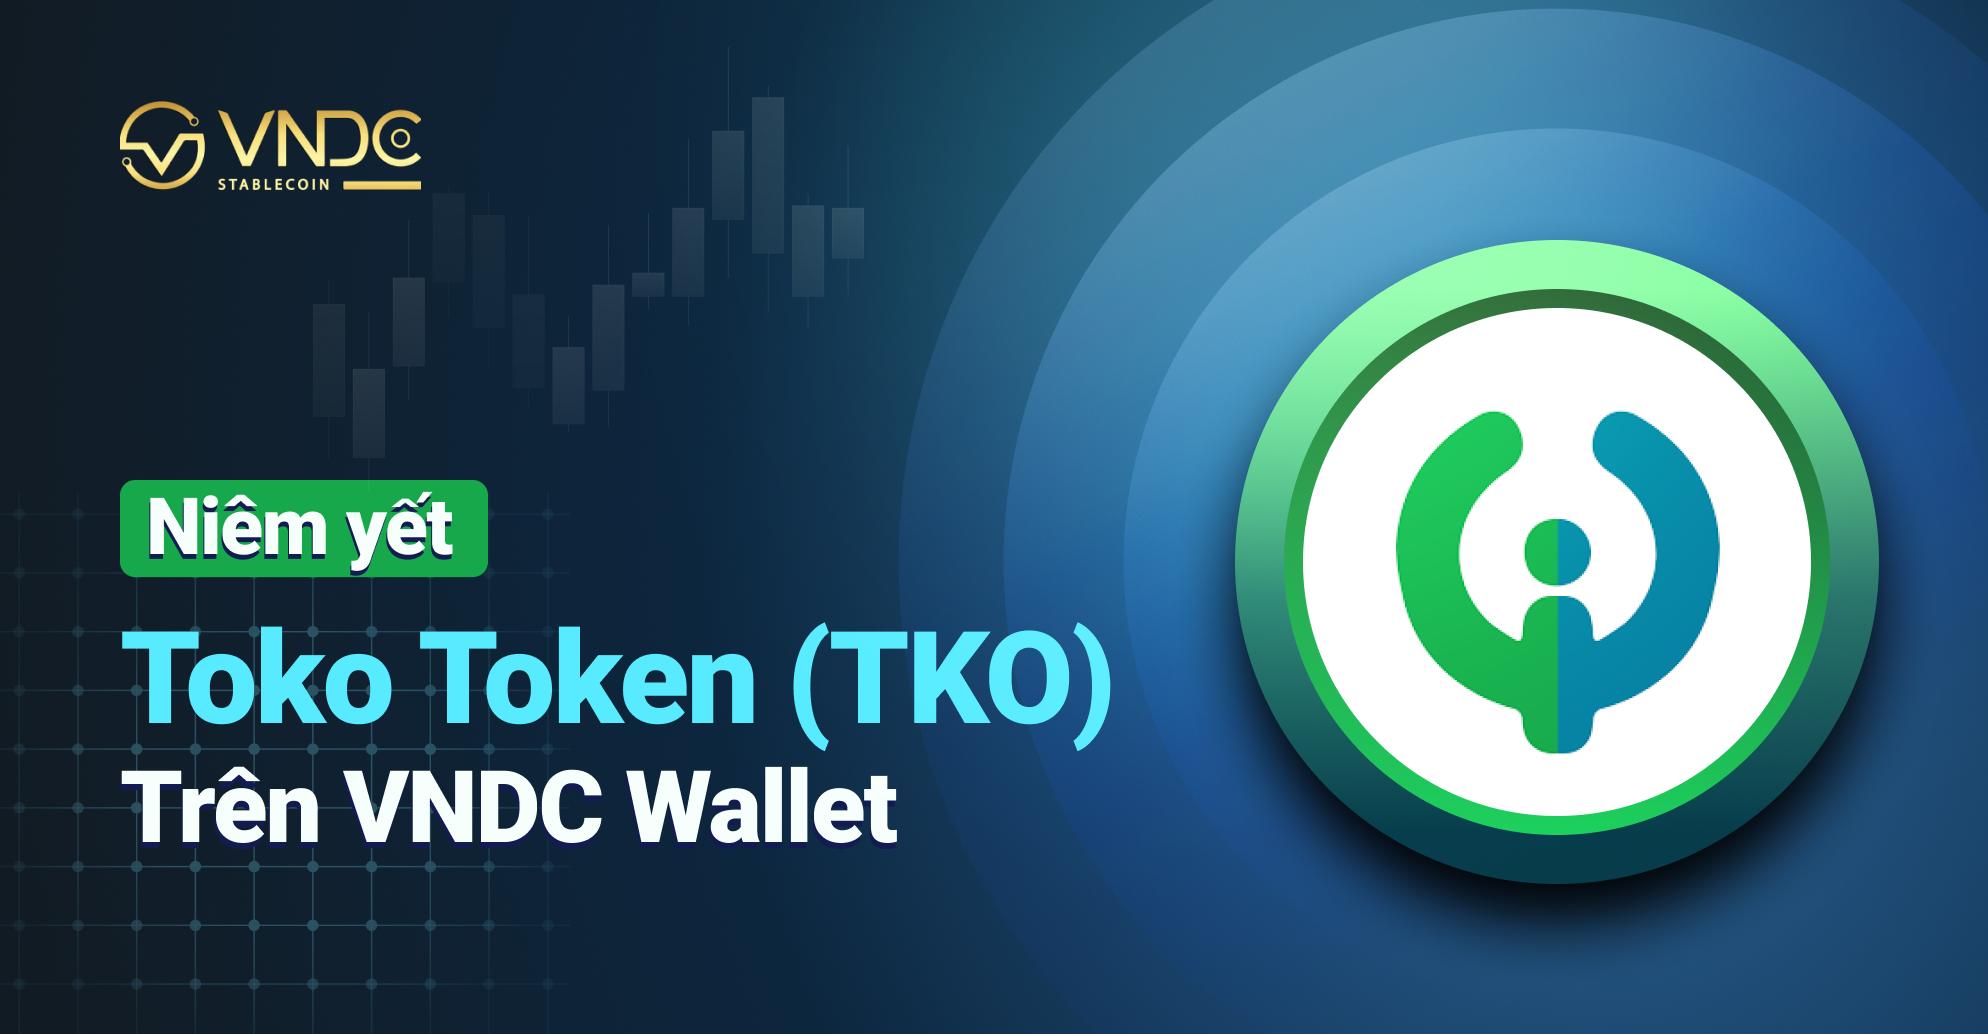 Niêm yết Toko Token (TKO) trên VNDC Wallet